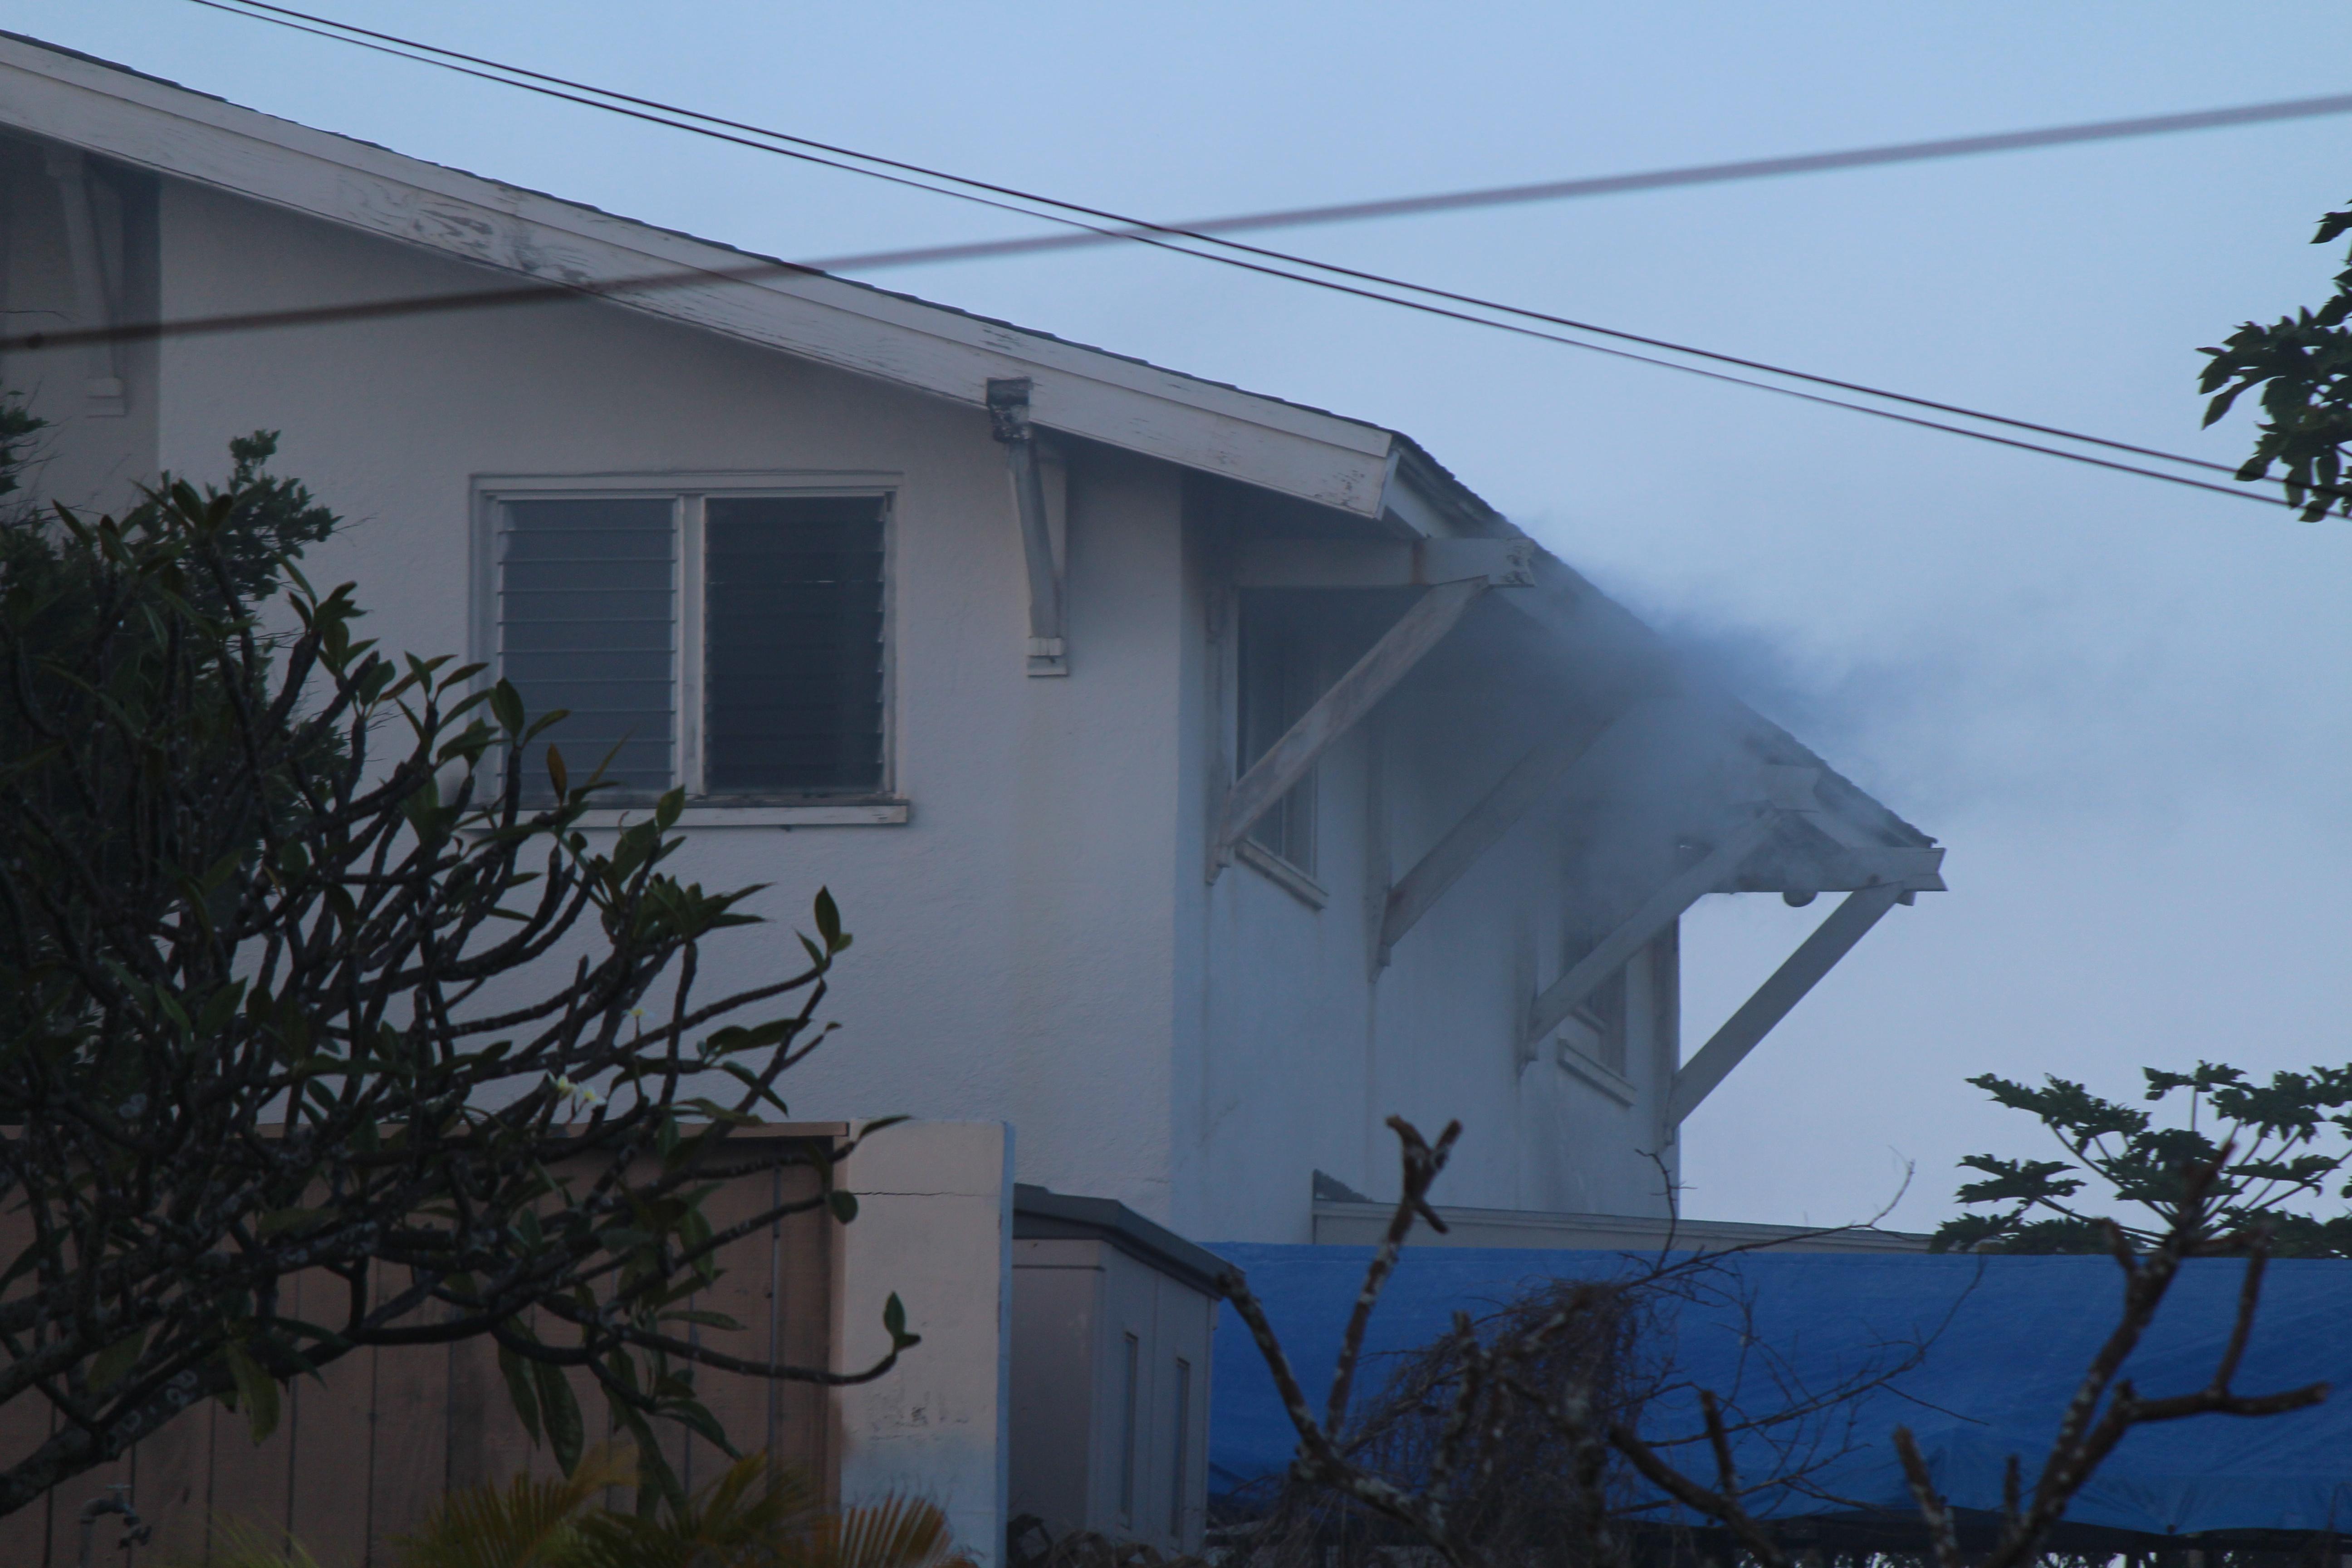 Wailuku House Fire - 10/29/15. Photo by Wendy Osher.